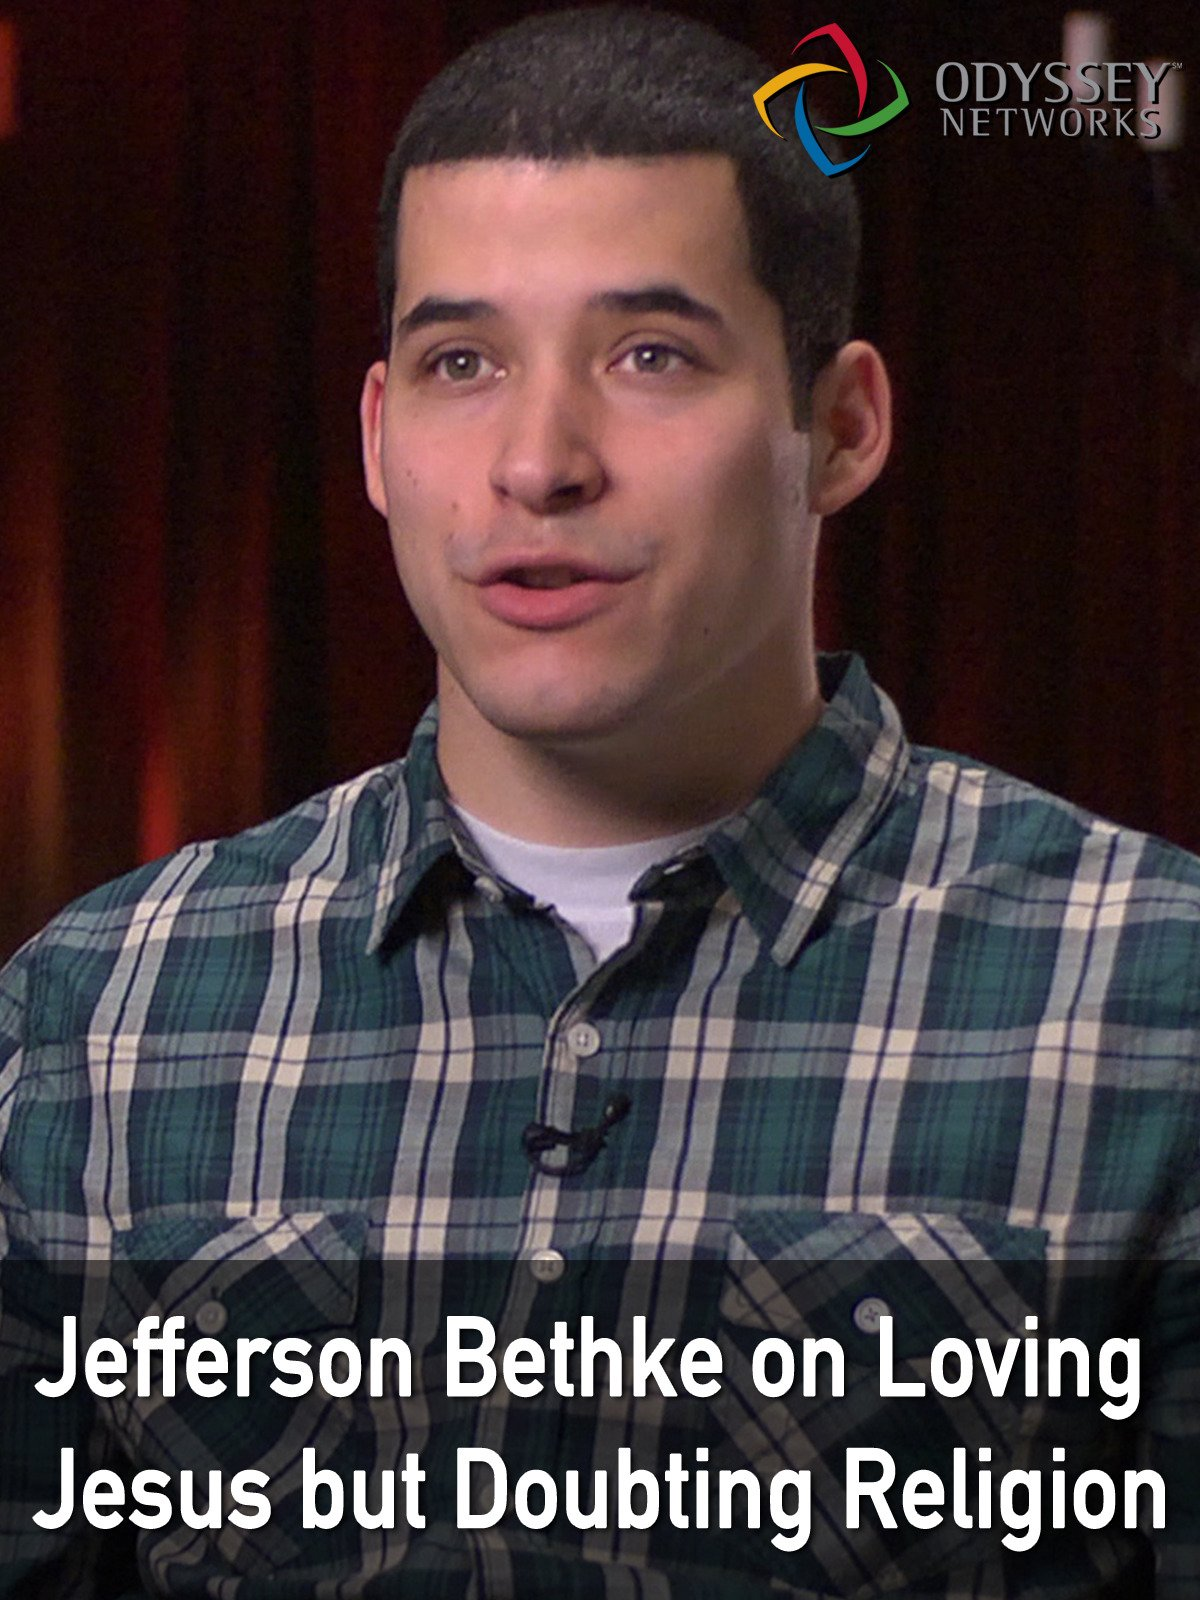 Clip: Jefferson Bethke on Loving Jesus but Doubting Religion